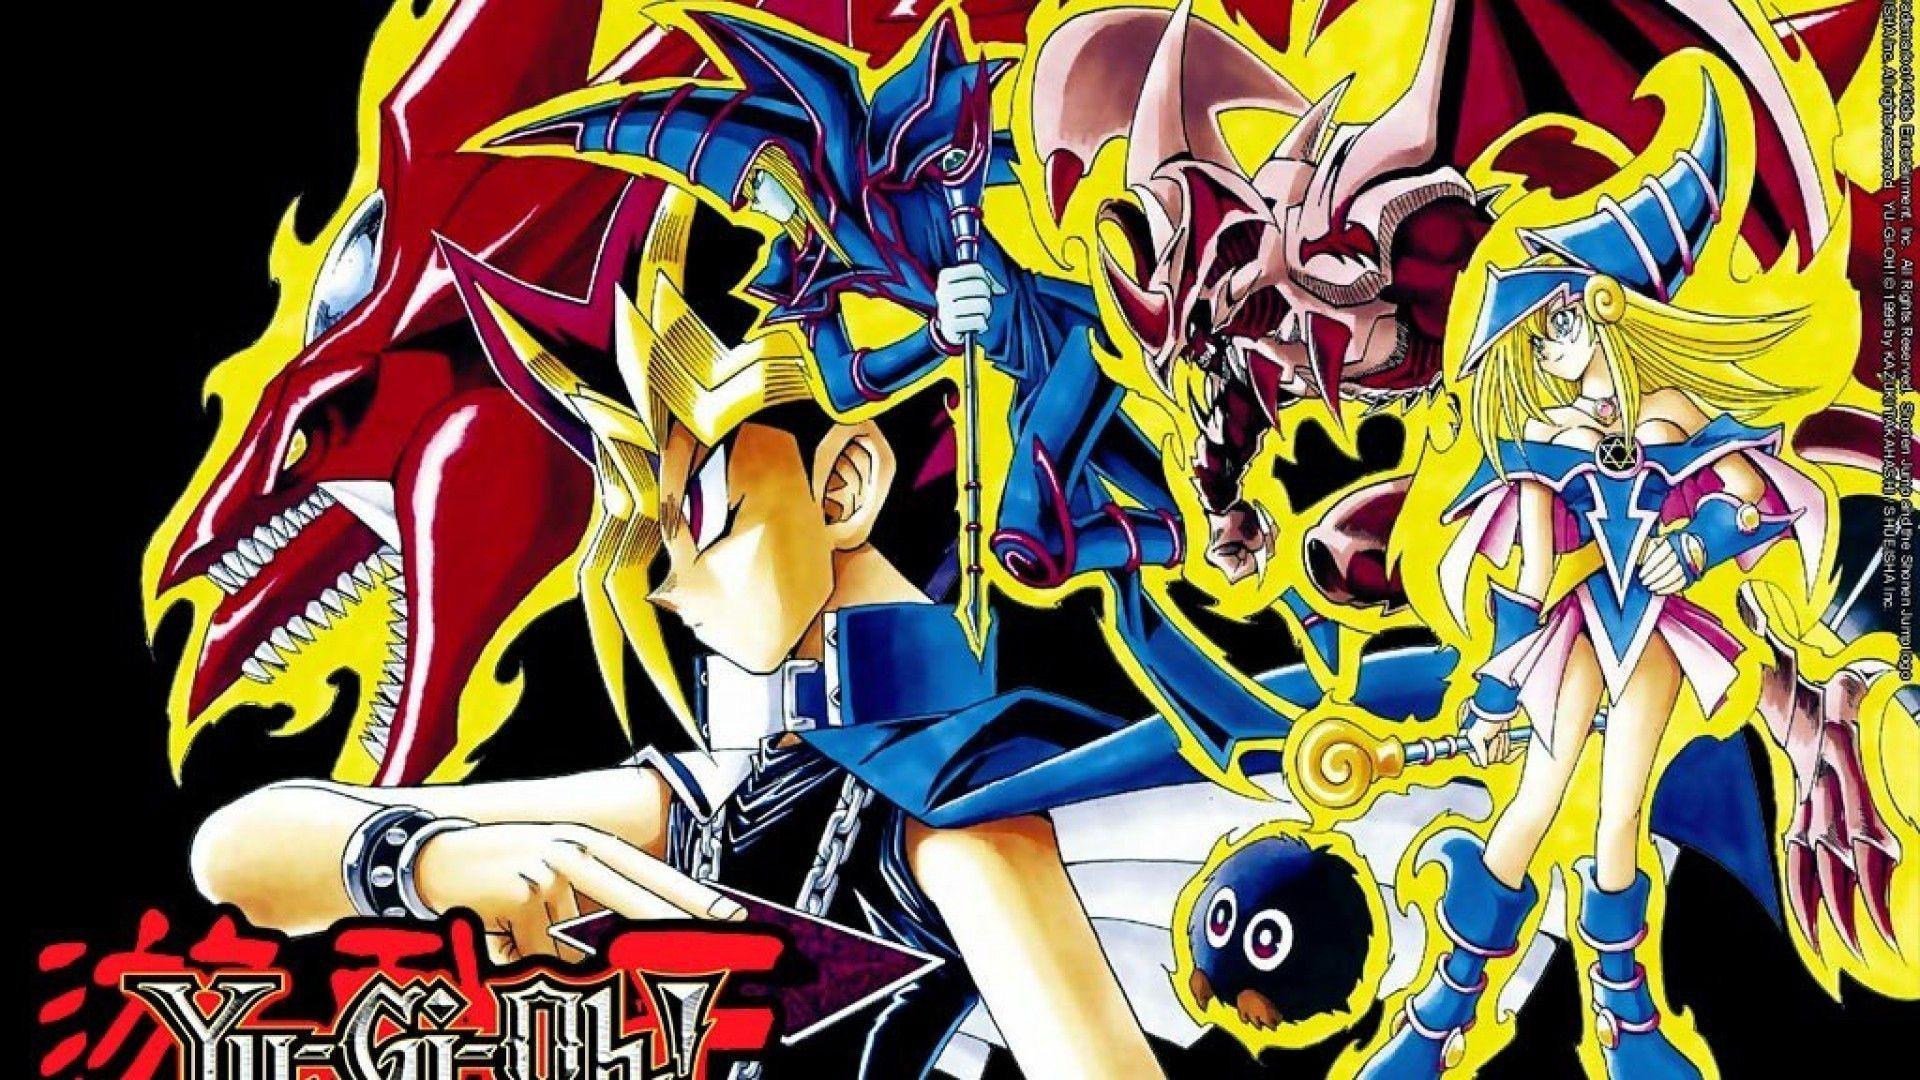 Yugioh Wallpaper HD Free Download | Anime Wallpaper